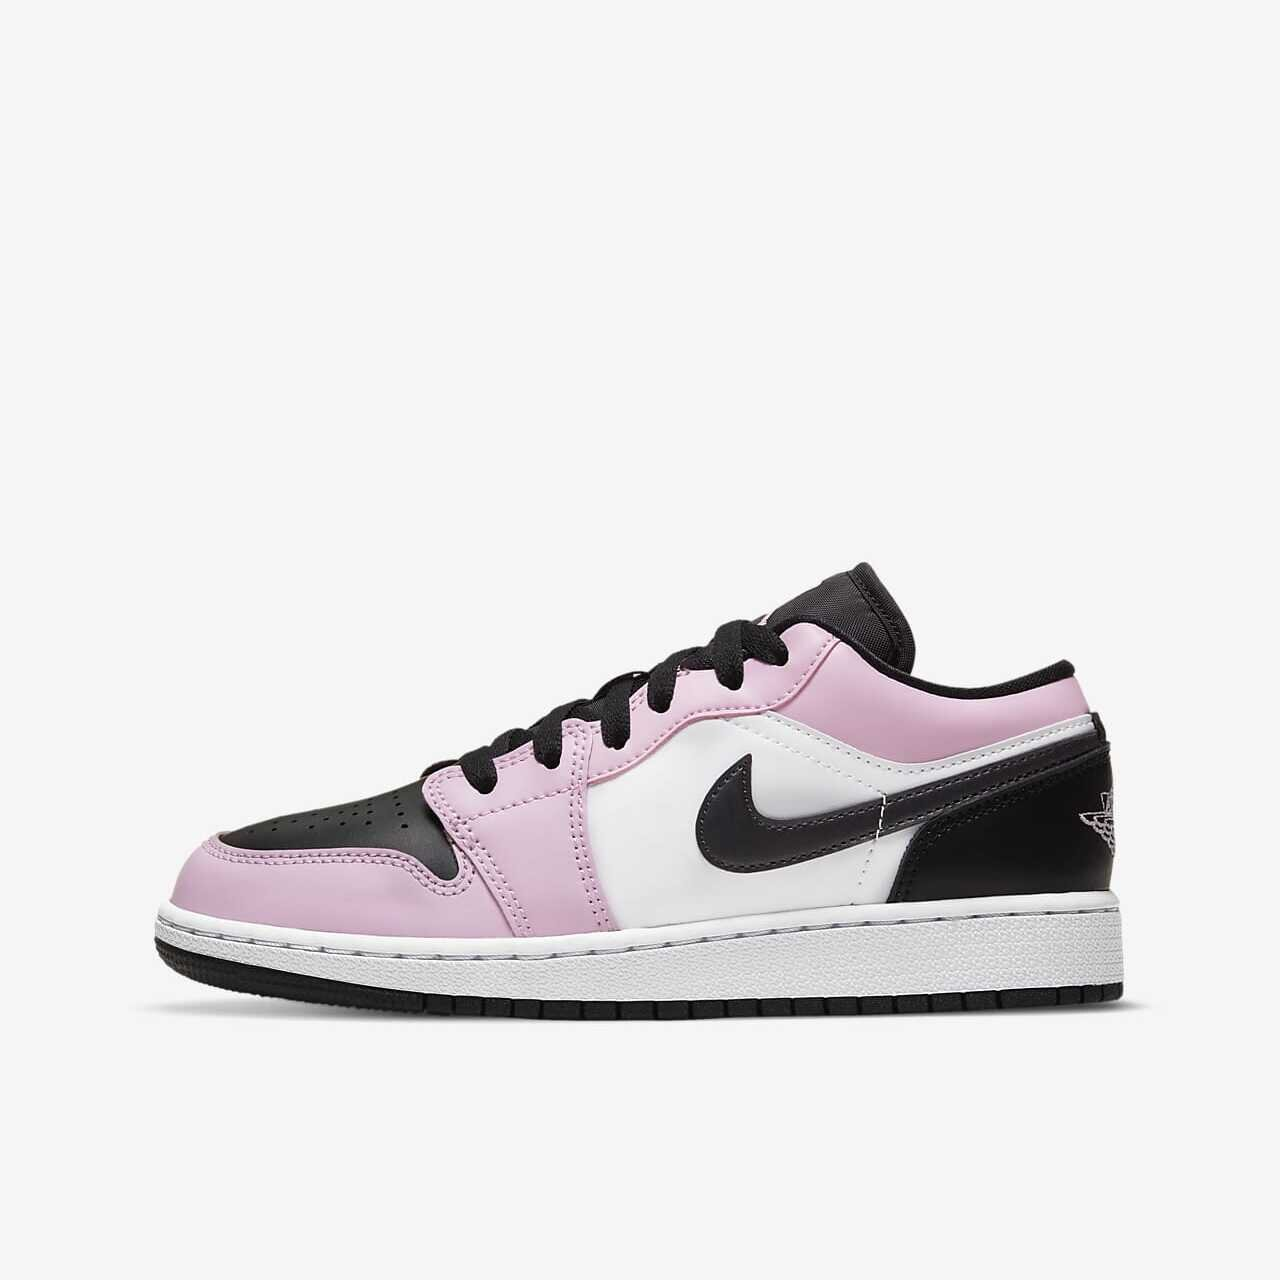 giay-sneaker-nu-nike-jordan-1-low-554723-601-gs-light-arctic-pink-hang-chinh-han